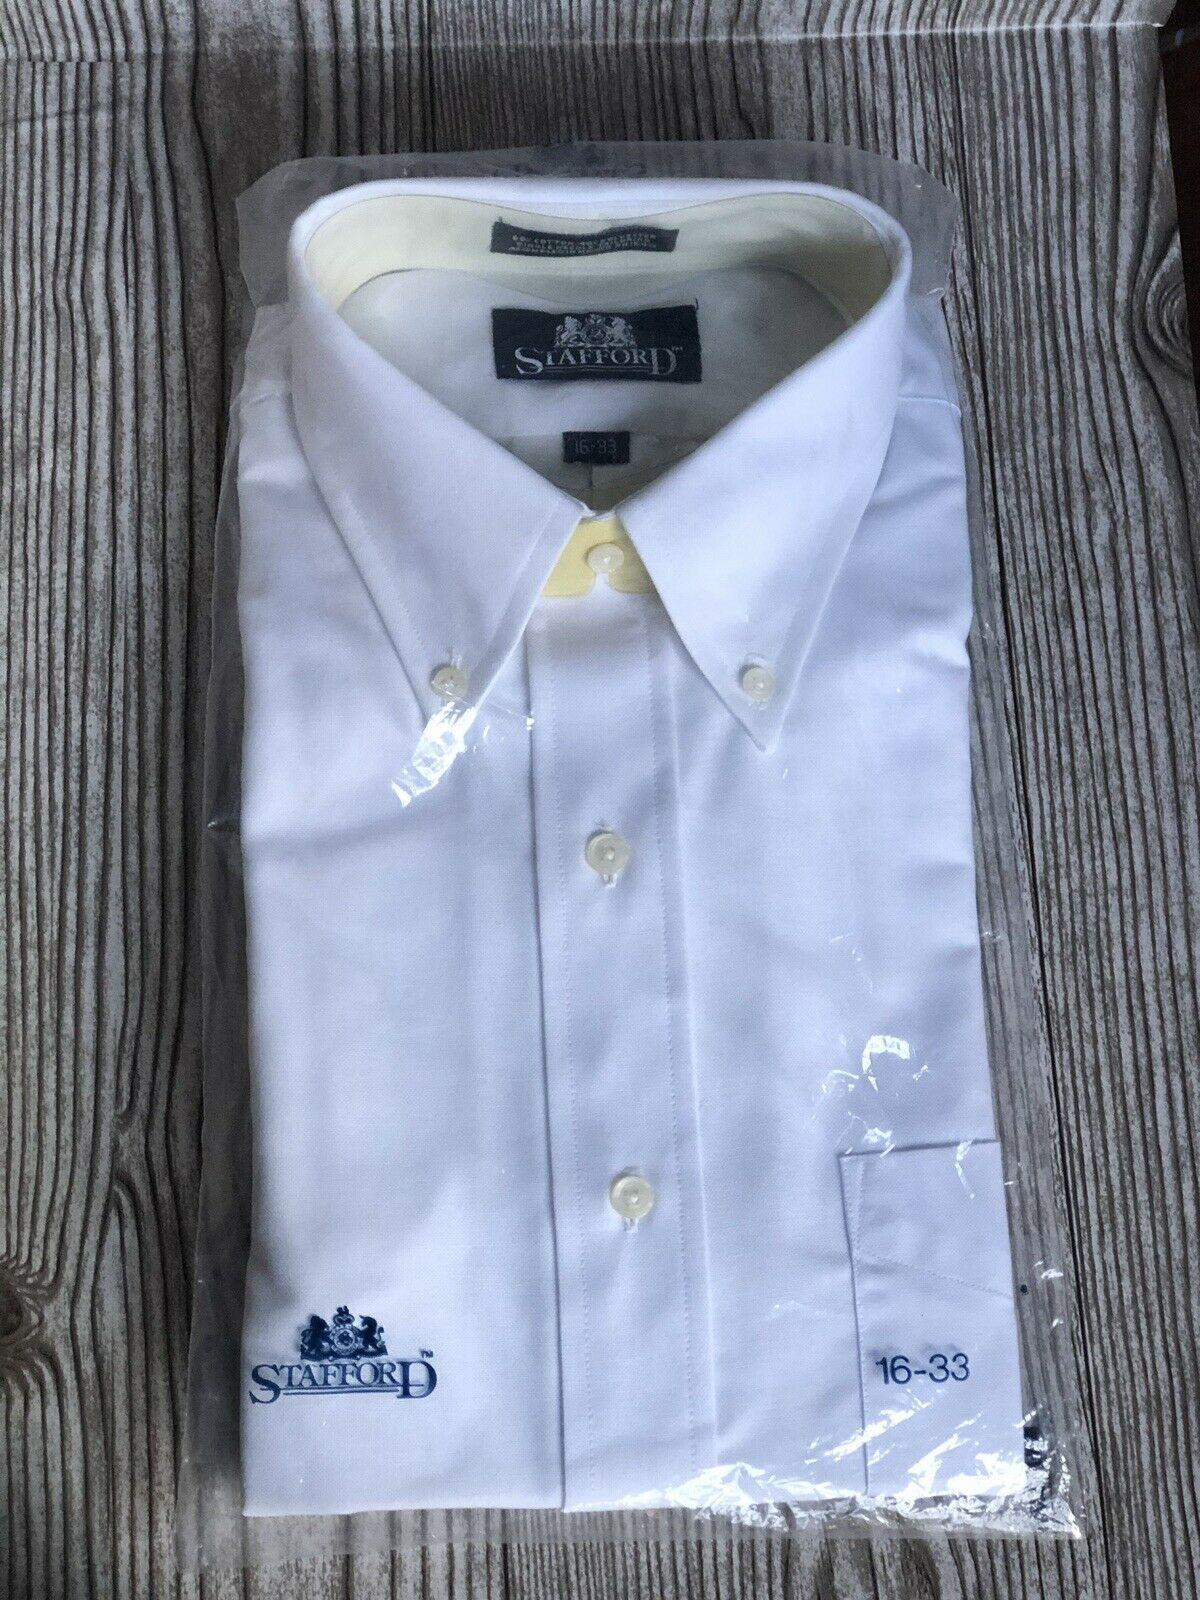 31++ Stafford dress shirts information